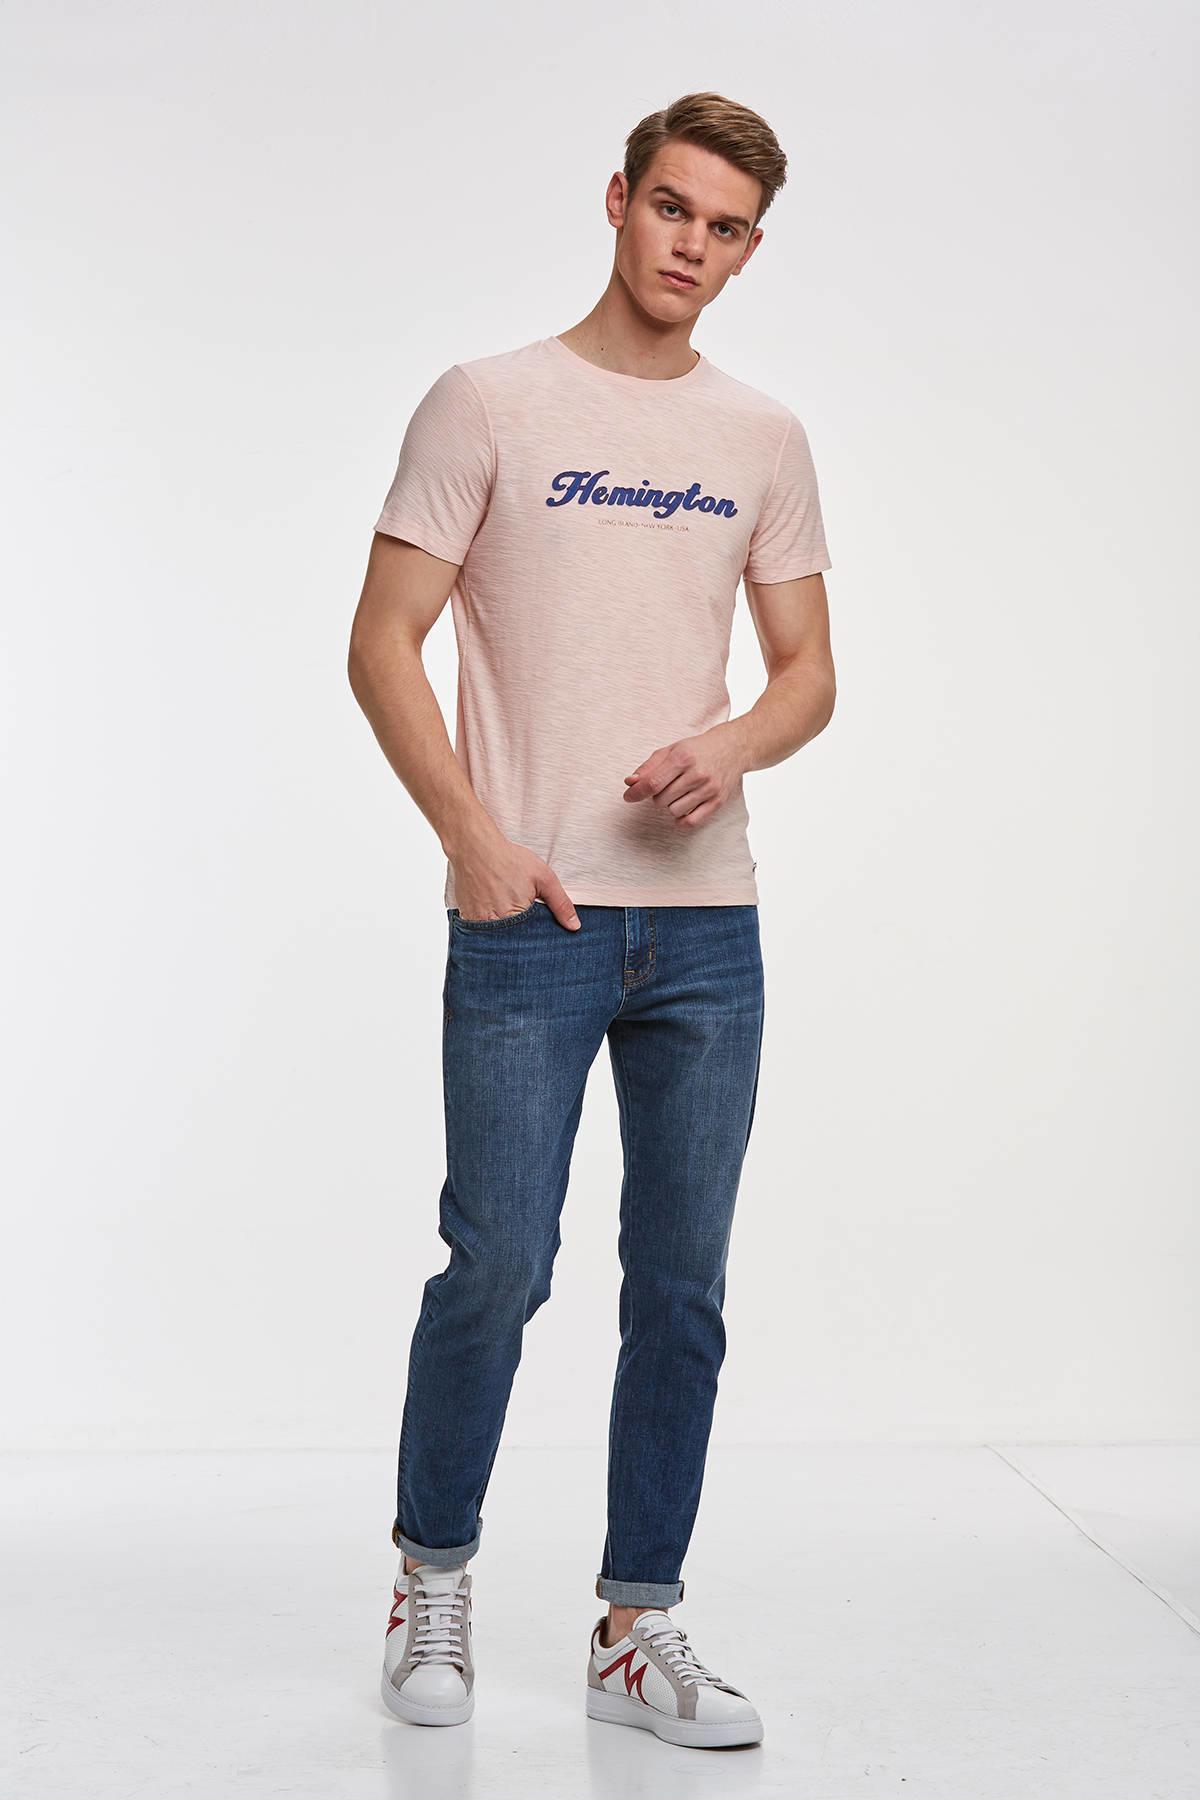 Nakış Logolu Pembe Bisiklet Yaka T-shirt